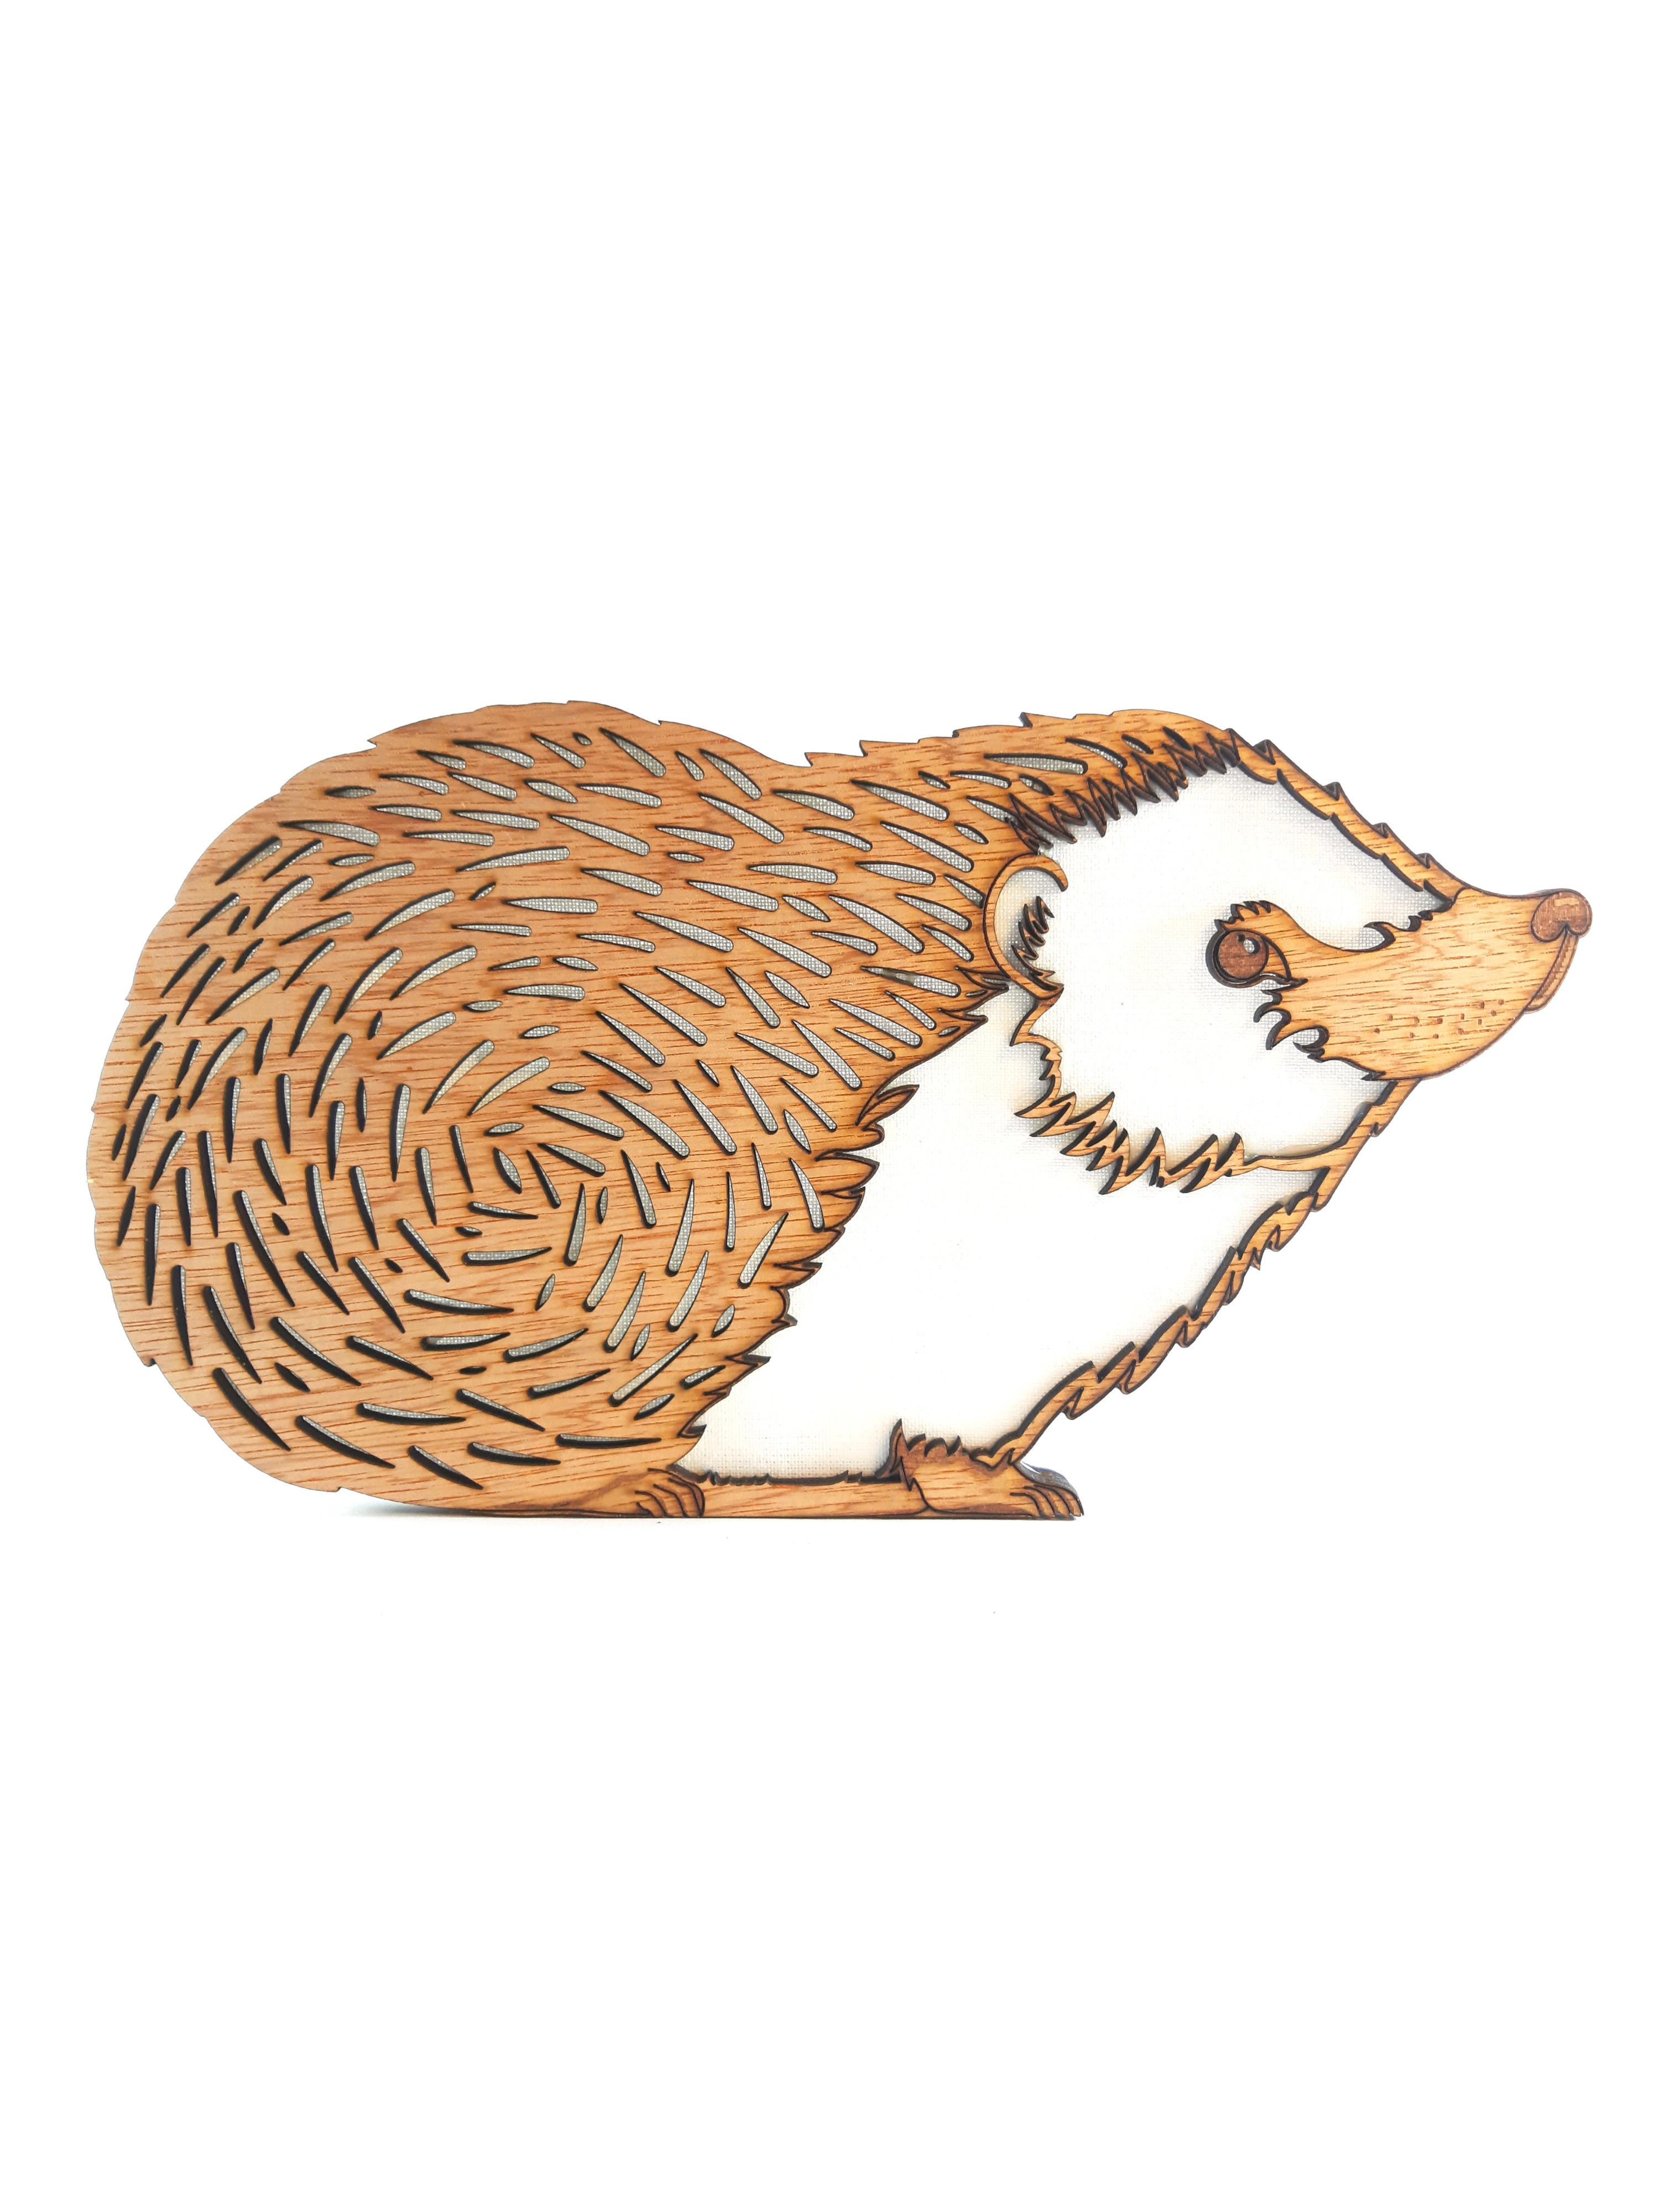 Lady Hedgerow, Hedgehog Lamp